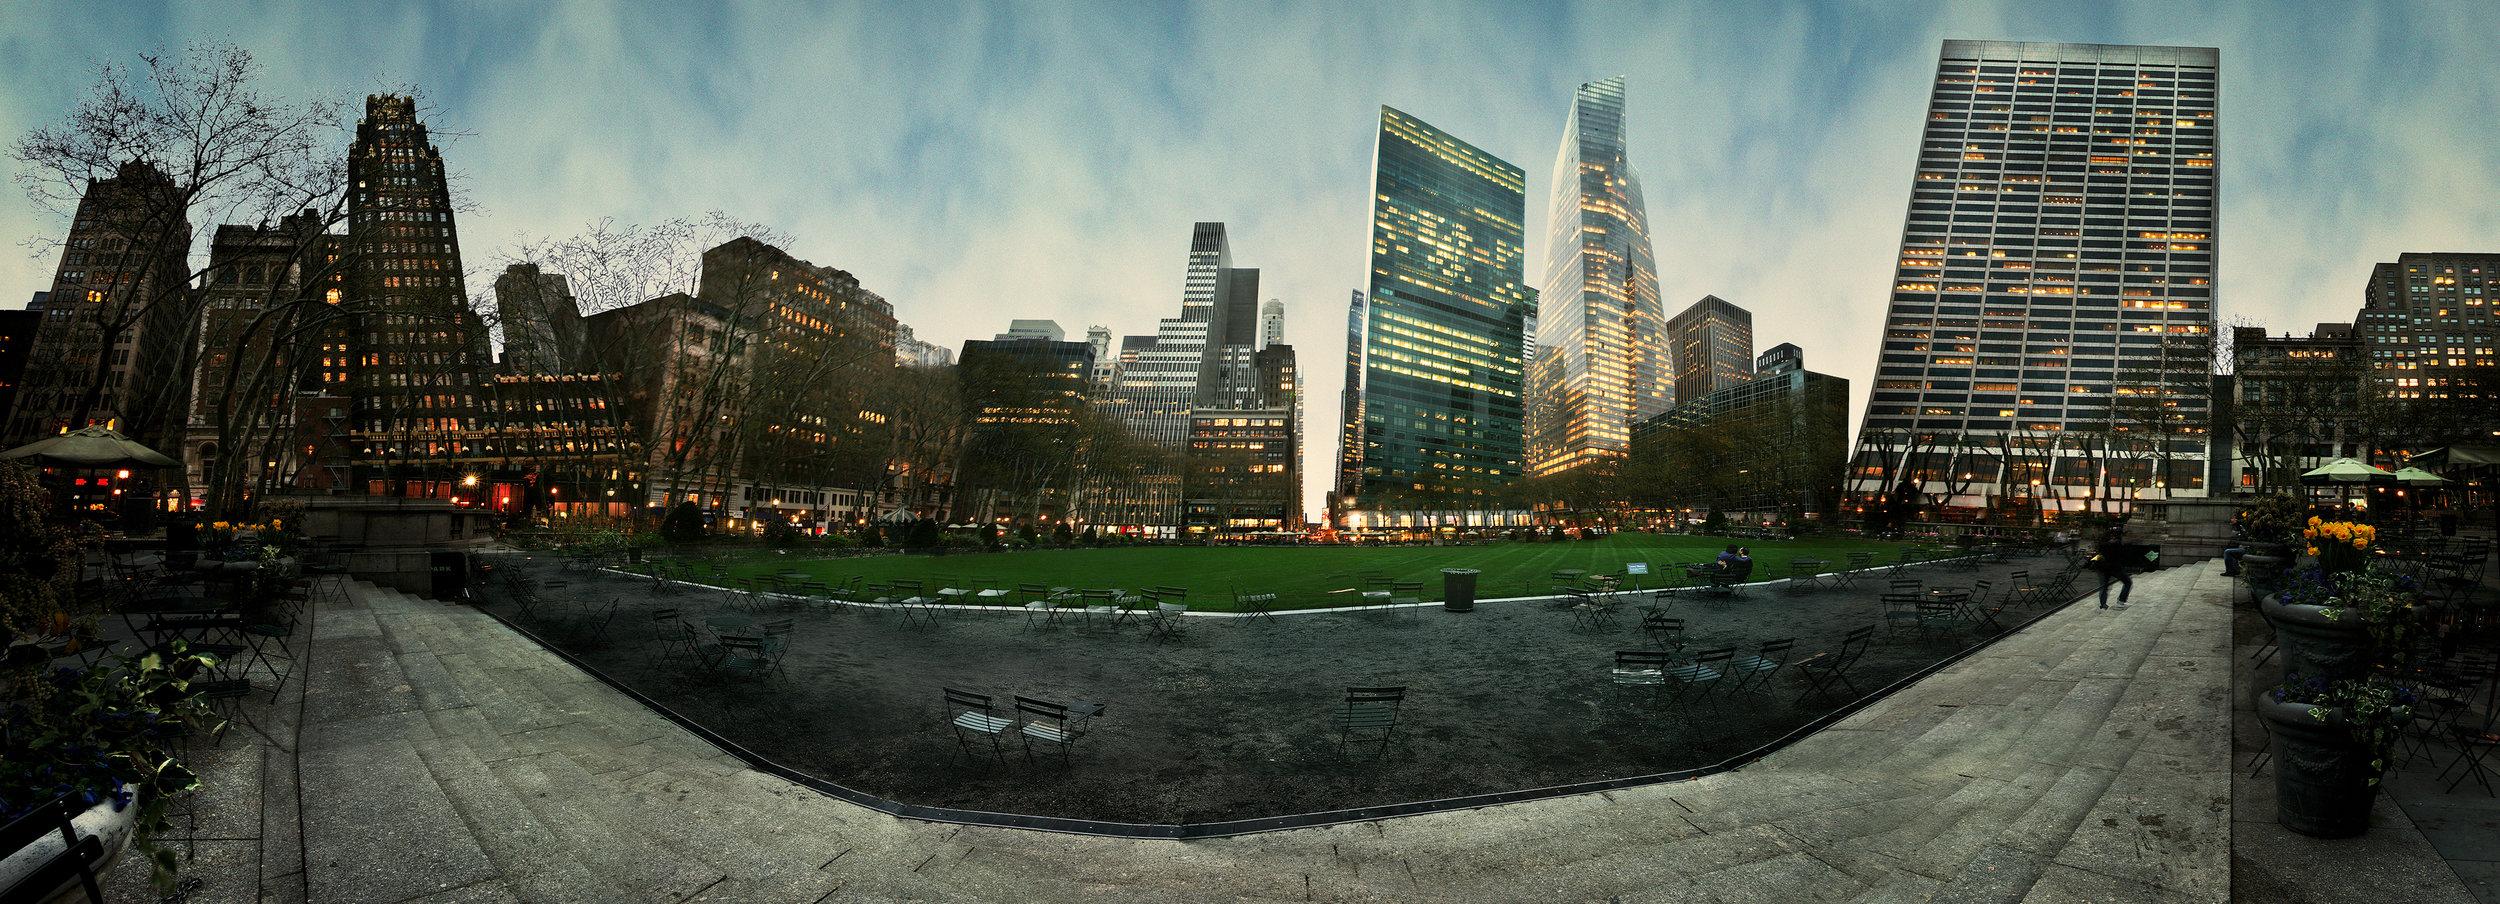 New York City-2.jpg